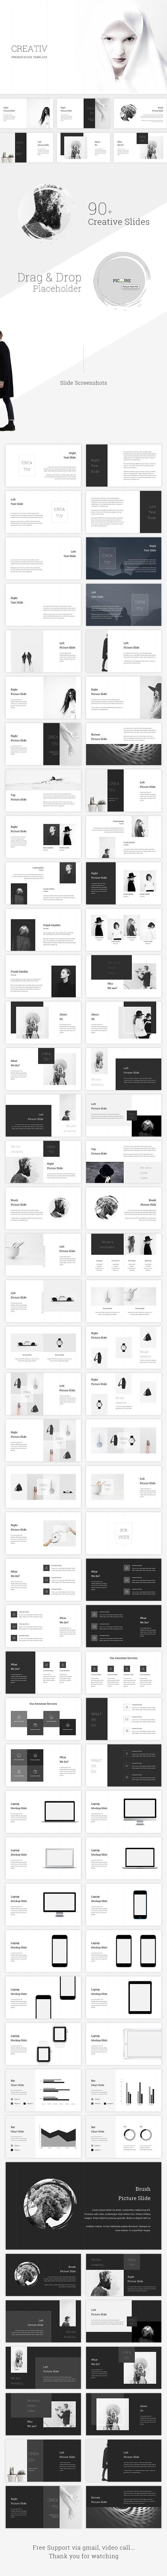 Creative Powerpoint Template - 90+ Unique Creative Slides